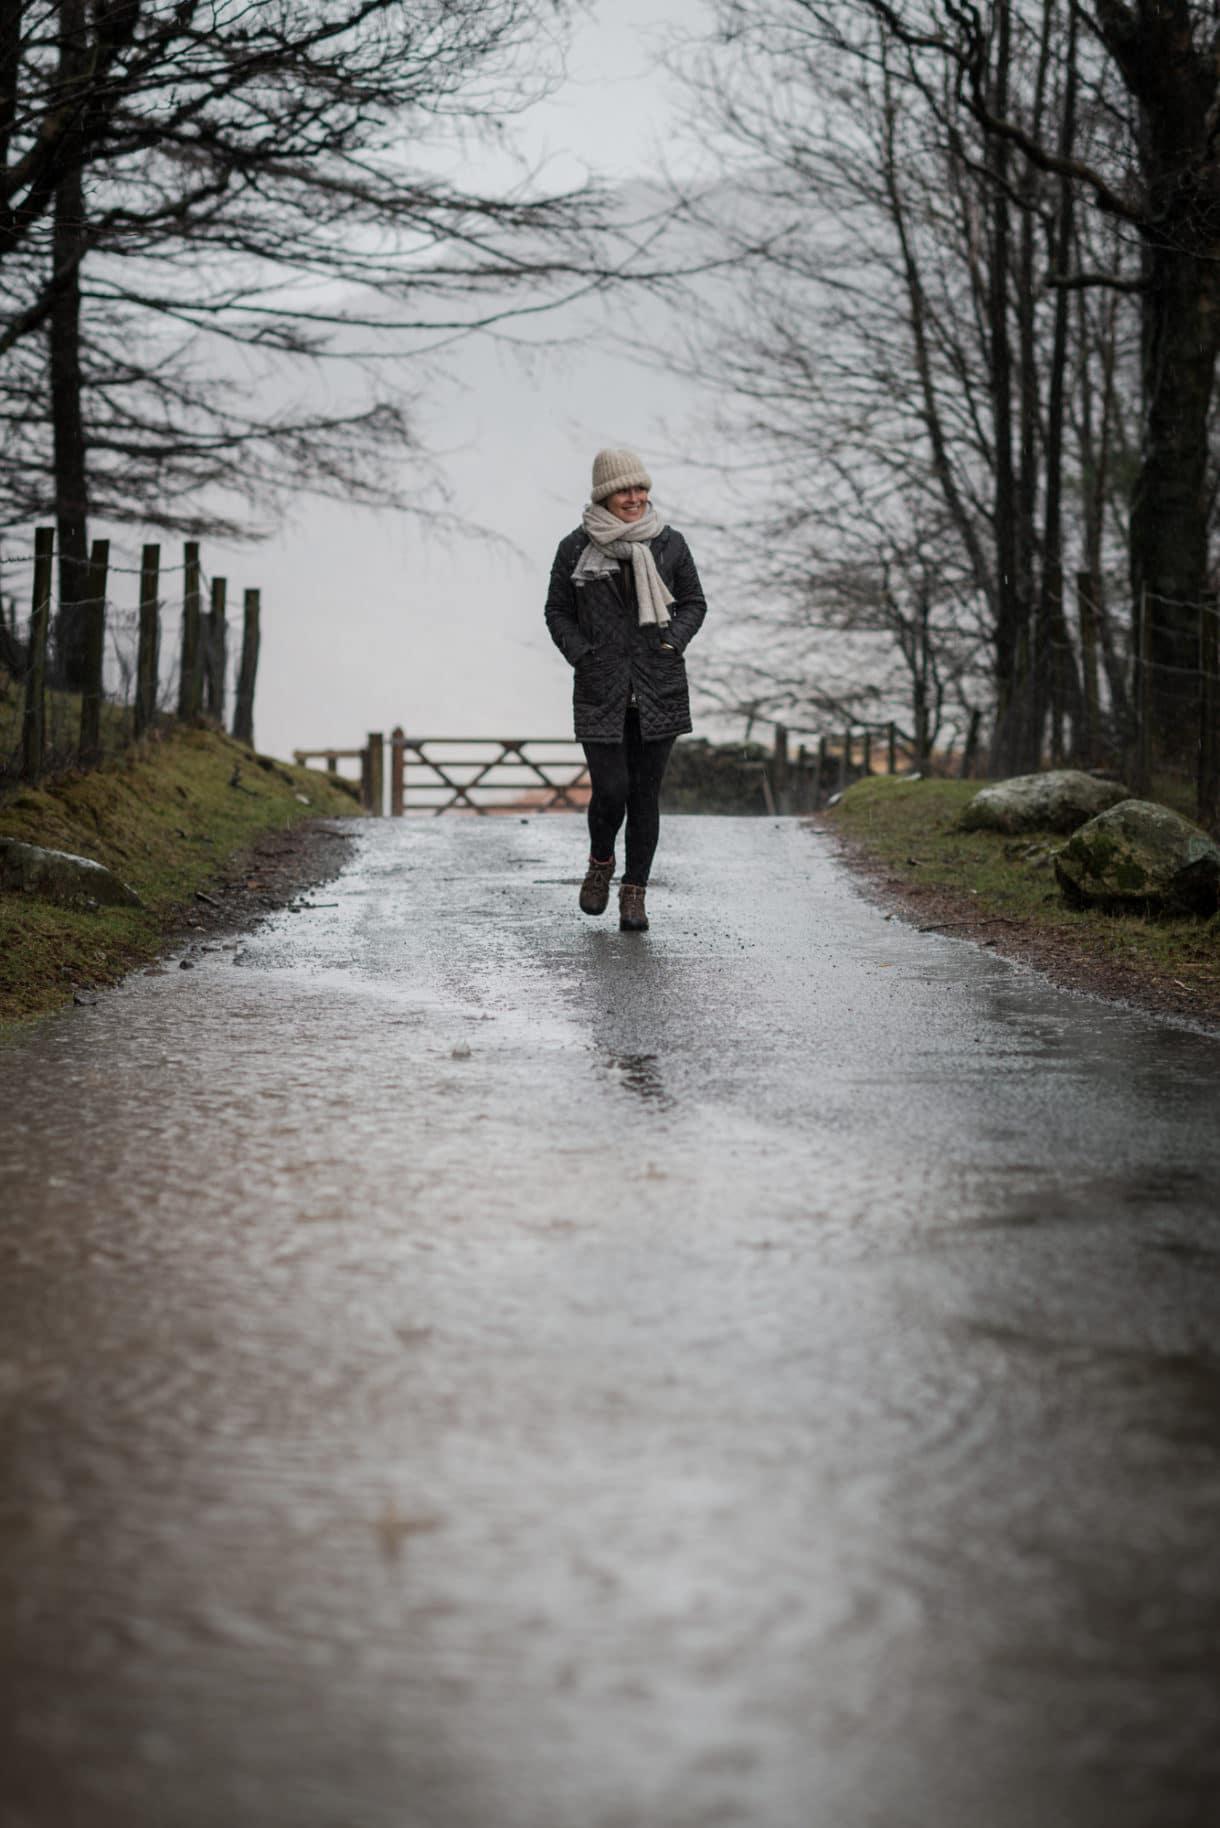 20160326 8540 1220x1828 - Lake District Impressions